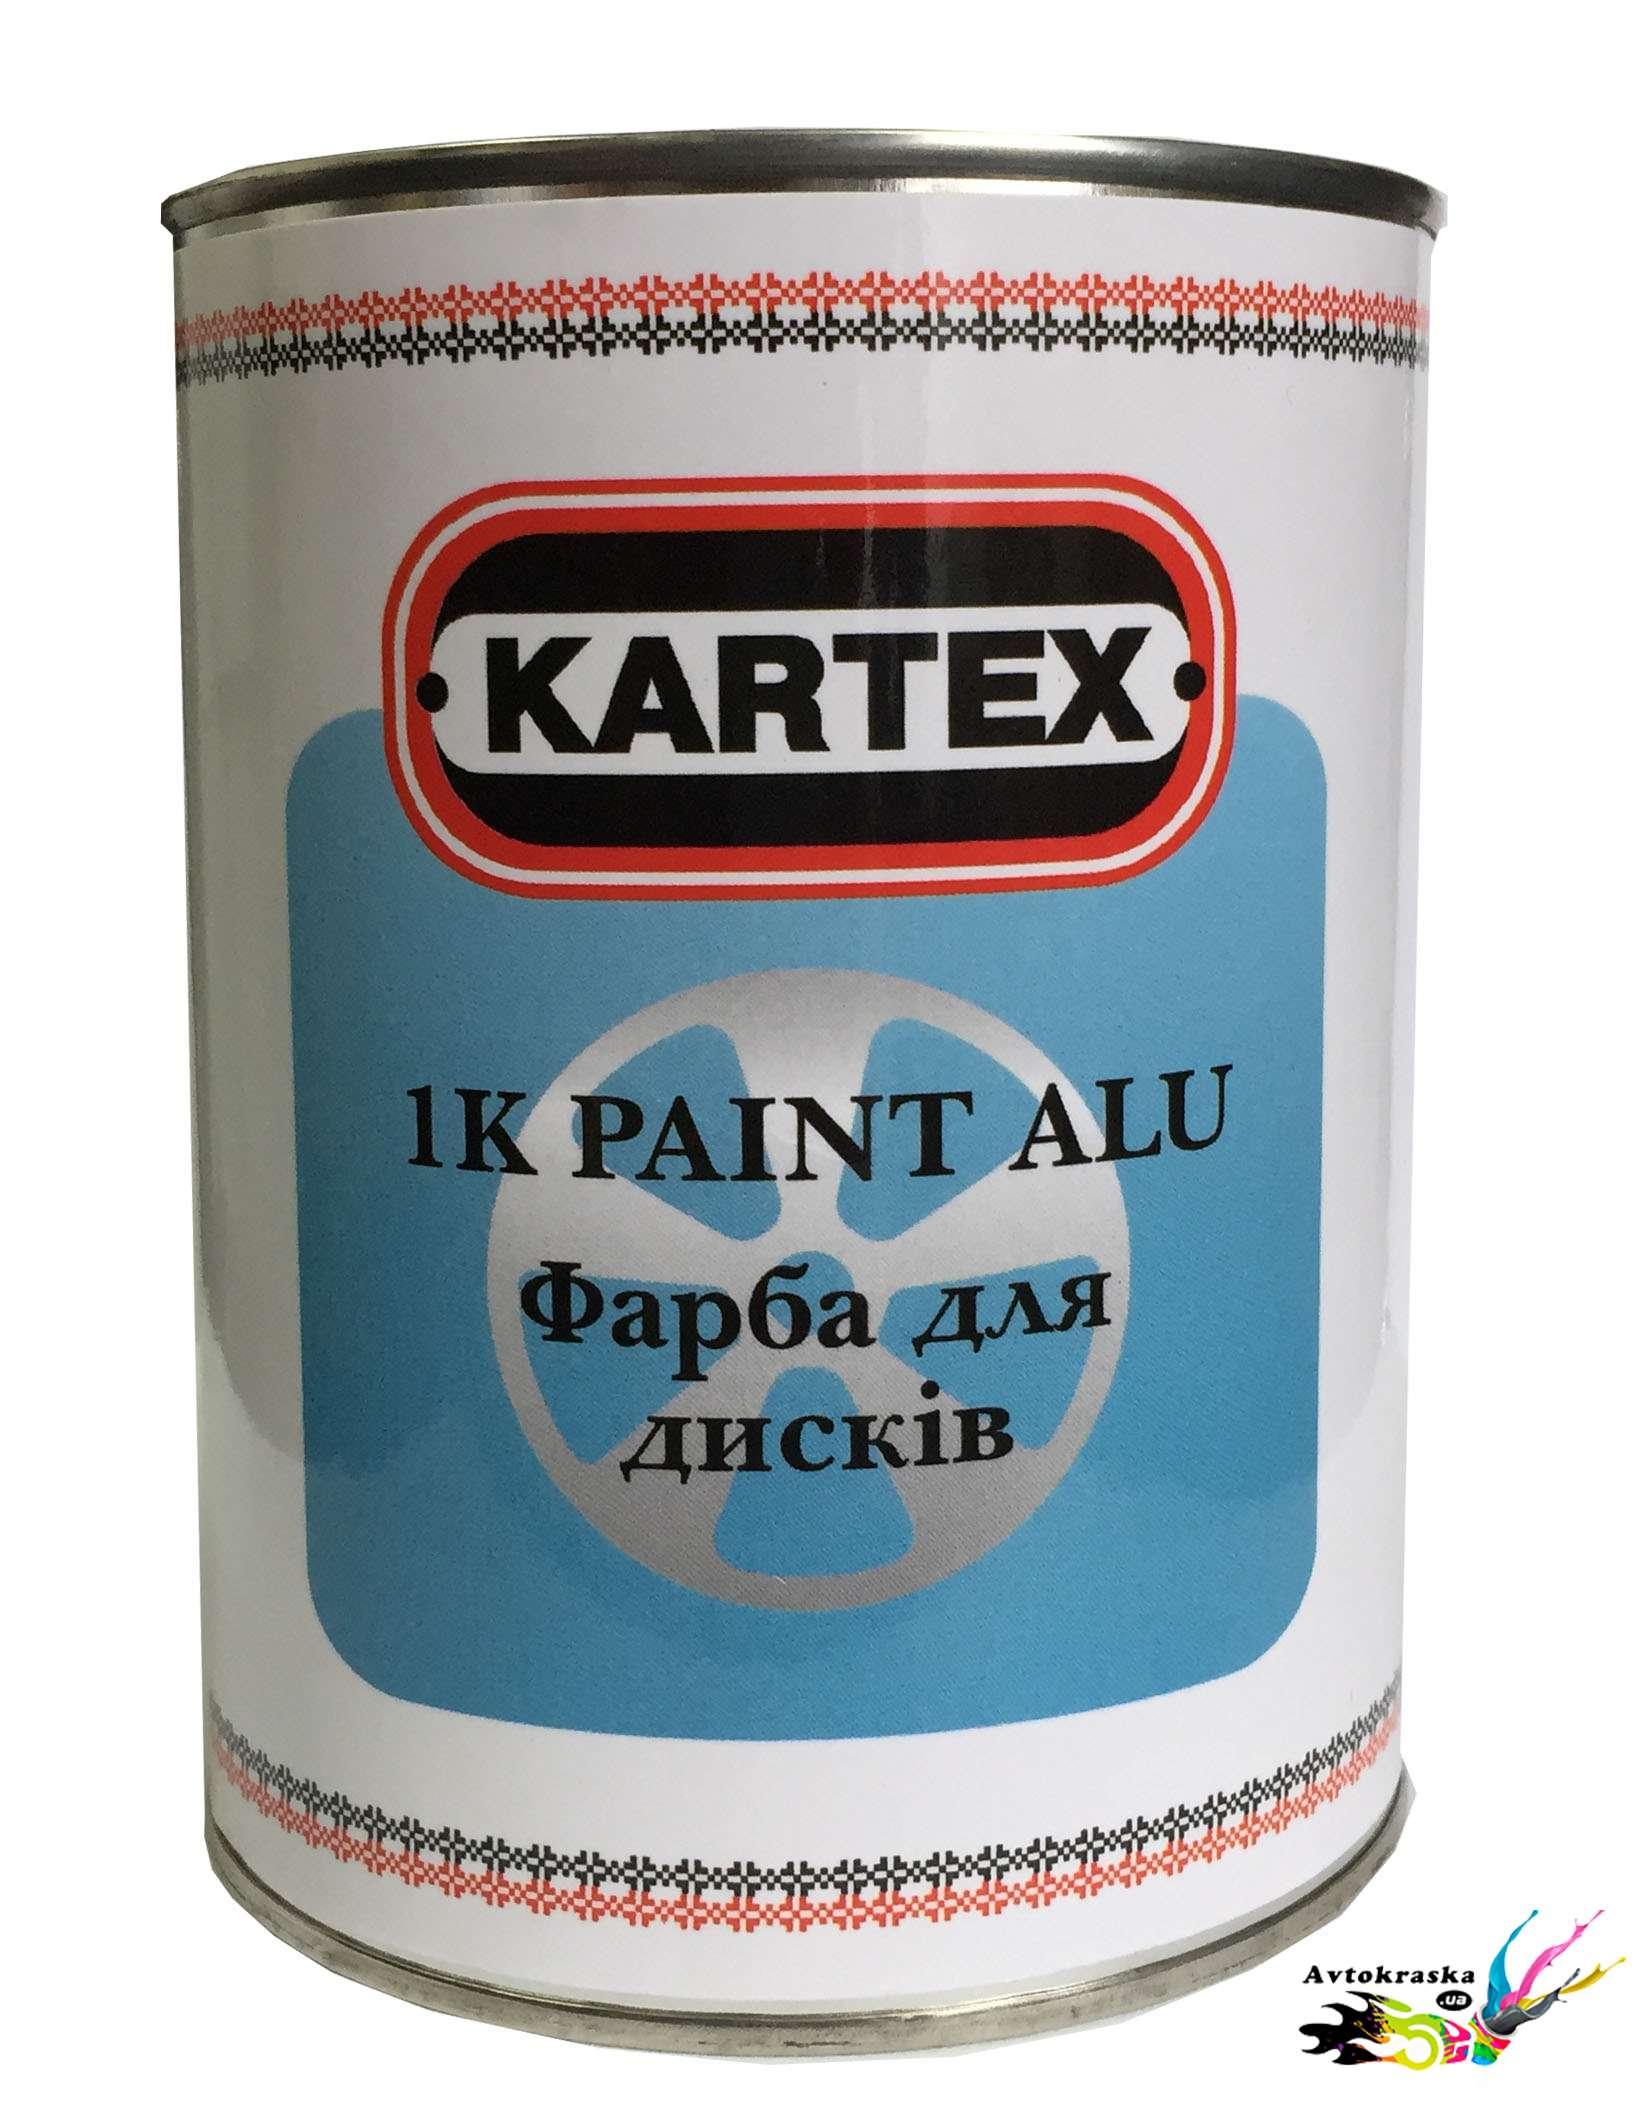 Автокраска для дисков Kartex 0,25 л